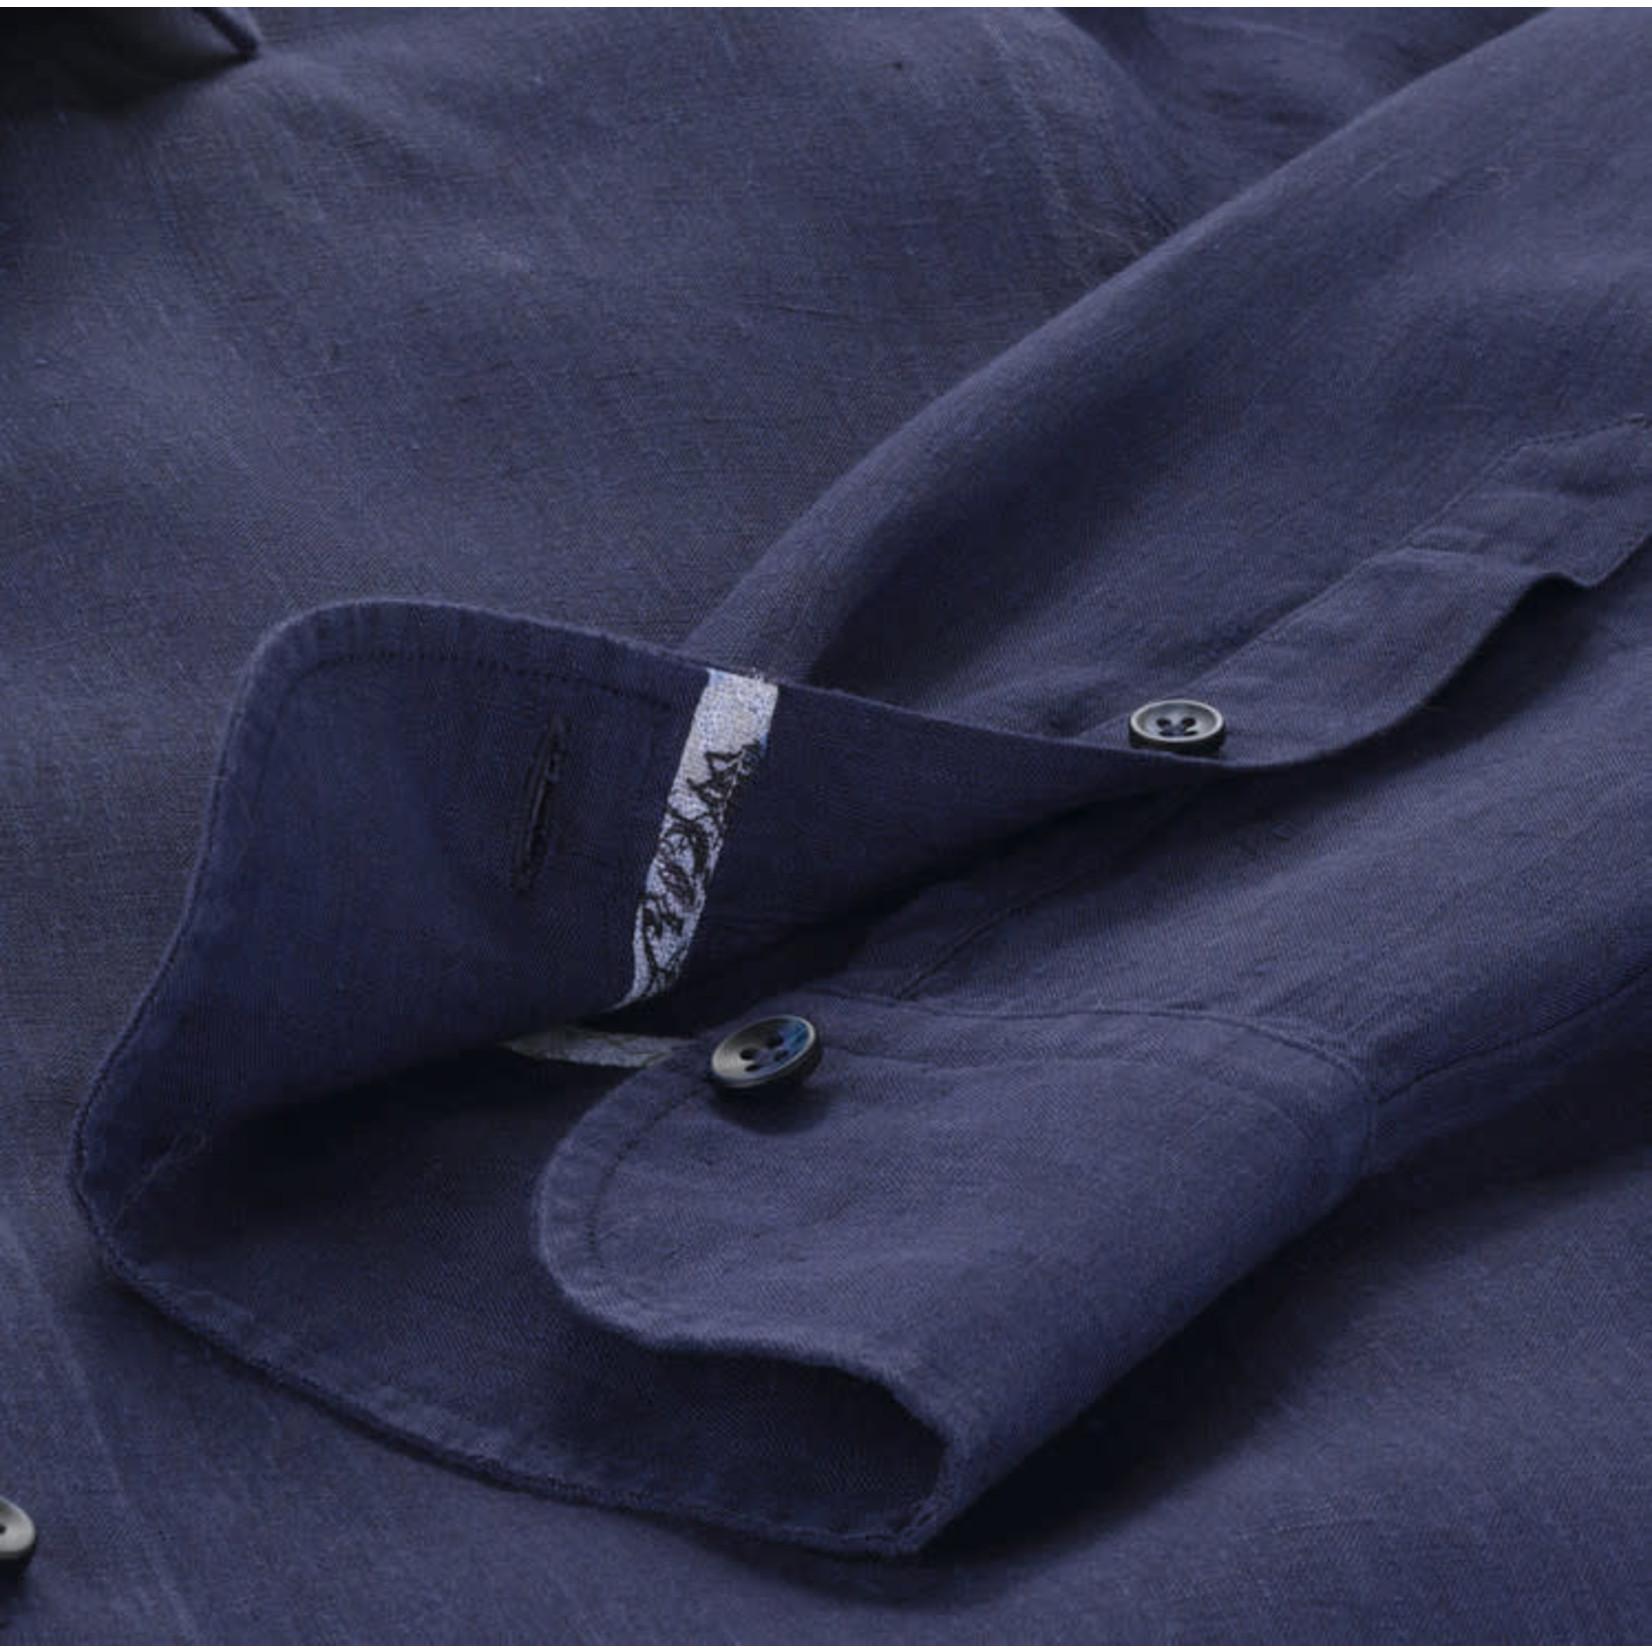 Olymp Signature linnen overhemd marine